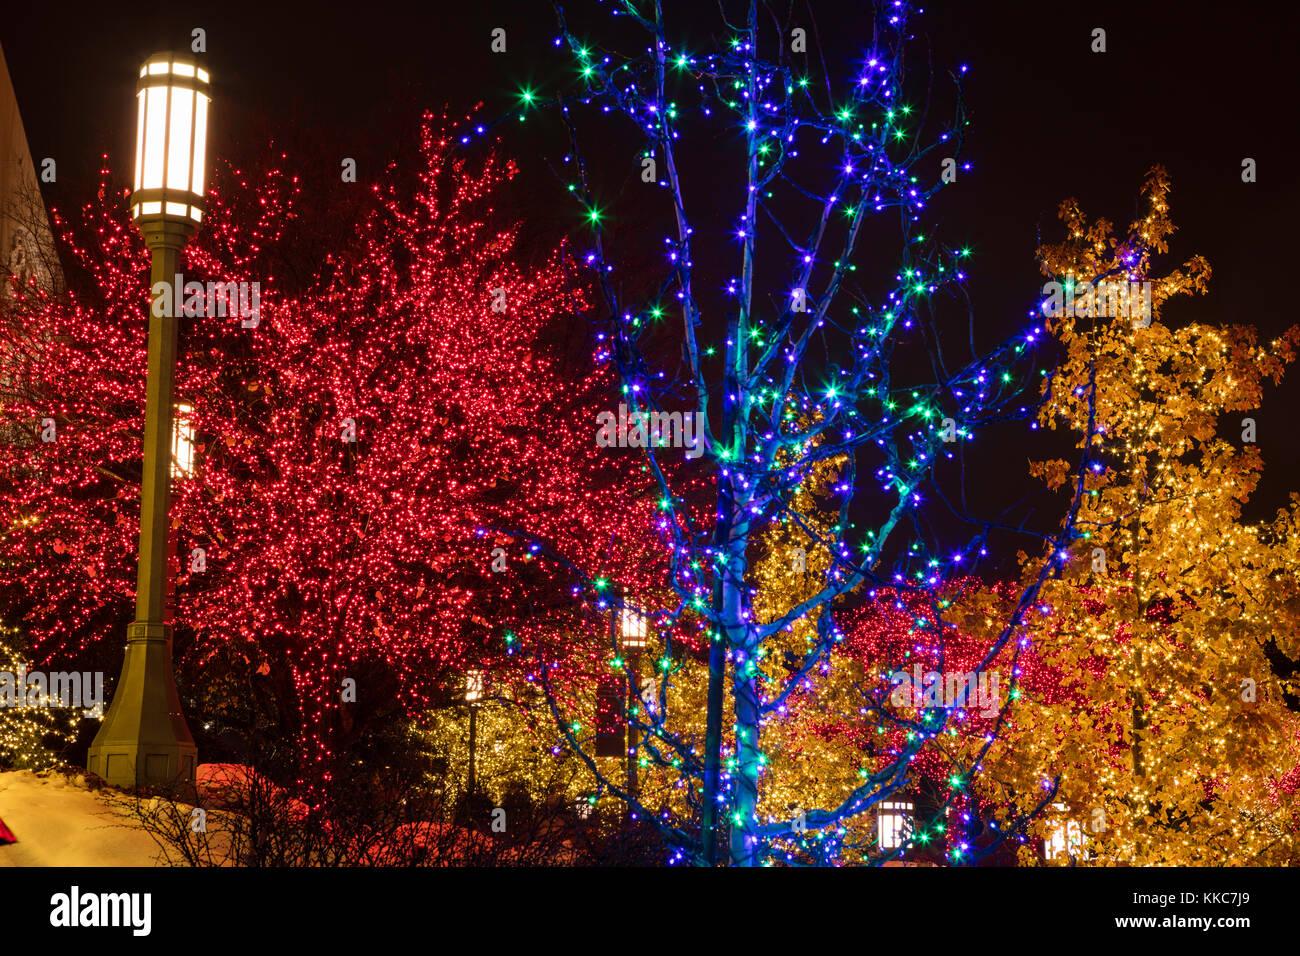 Christmas Lights At Temple Square, Salt Lake City, Utah